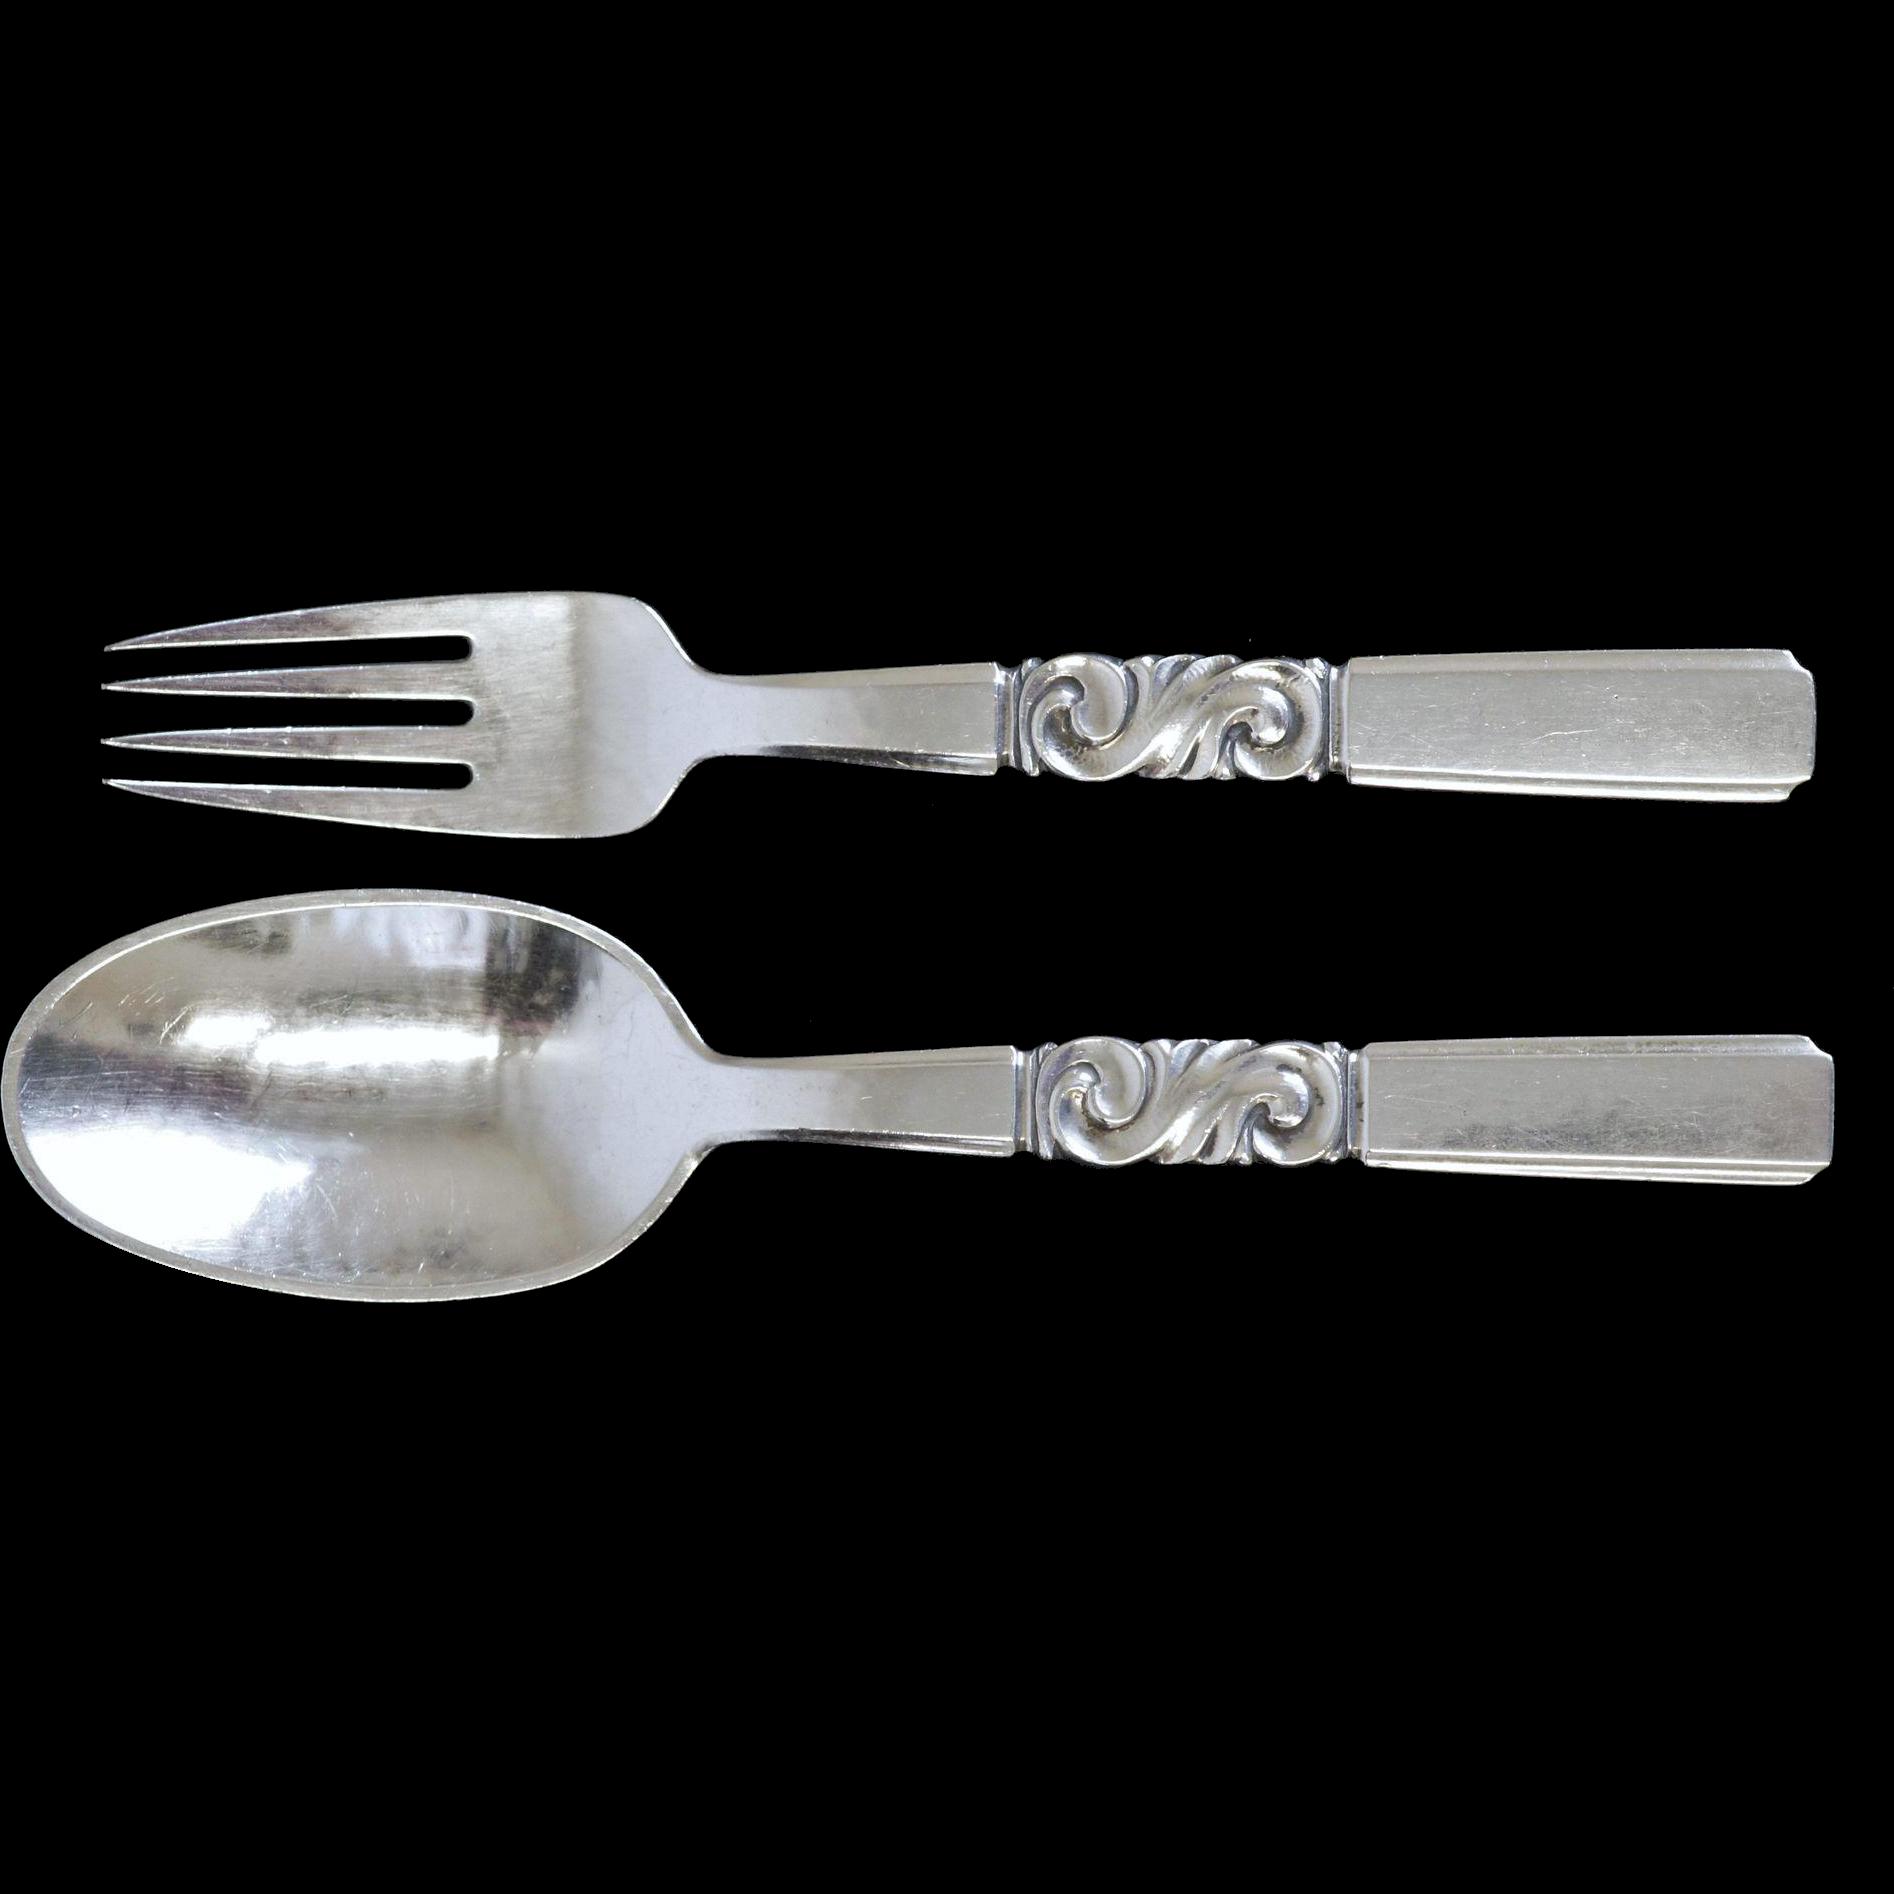 Georg Jensen Fork and Spoon in Scroll Pattern